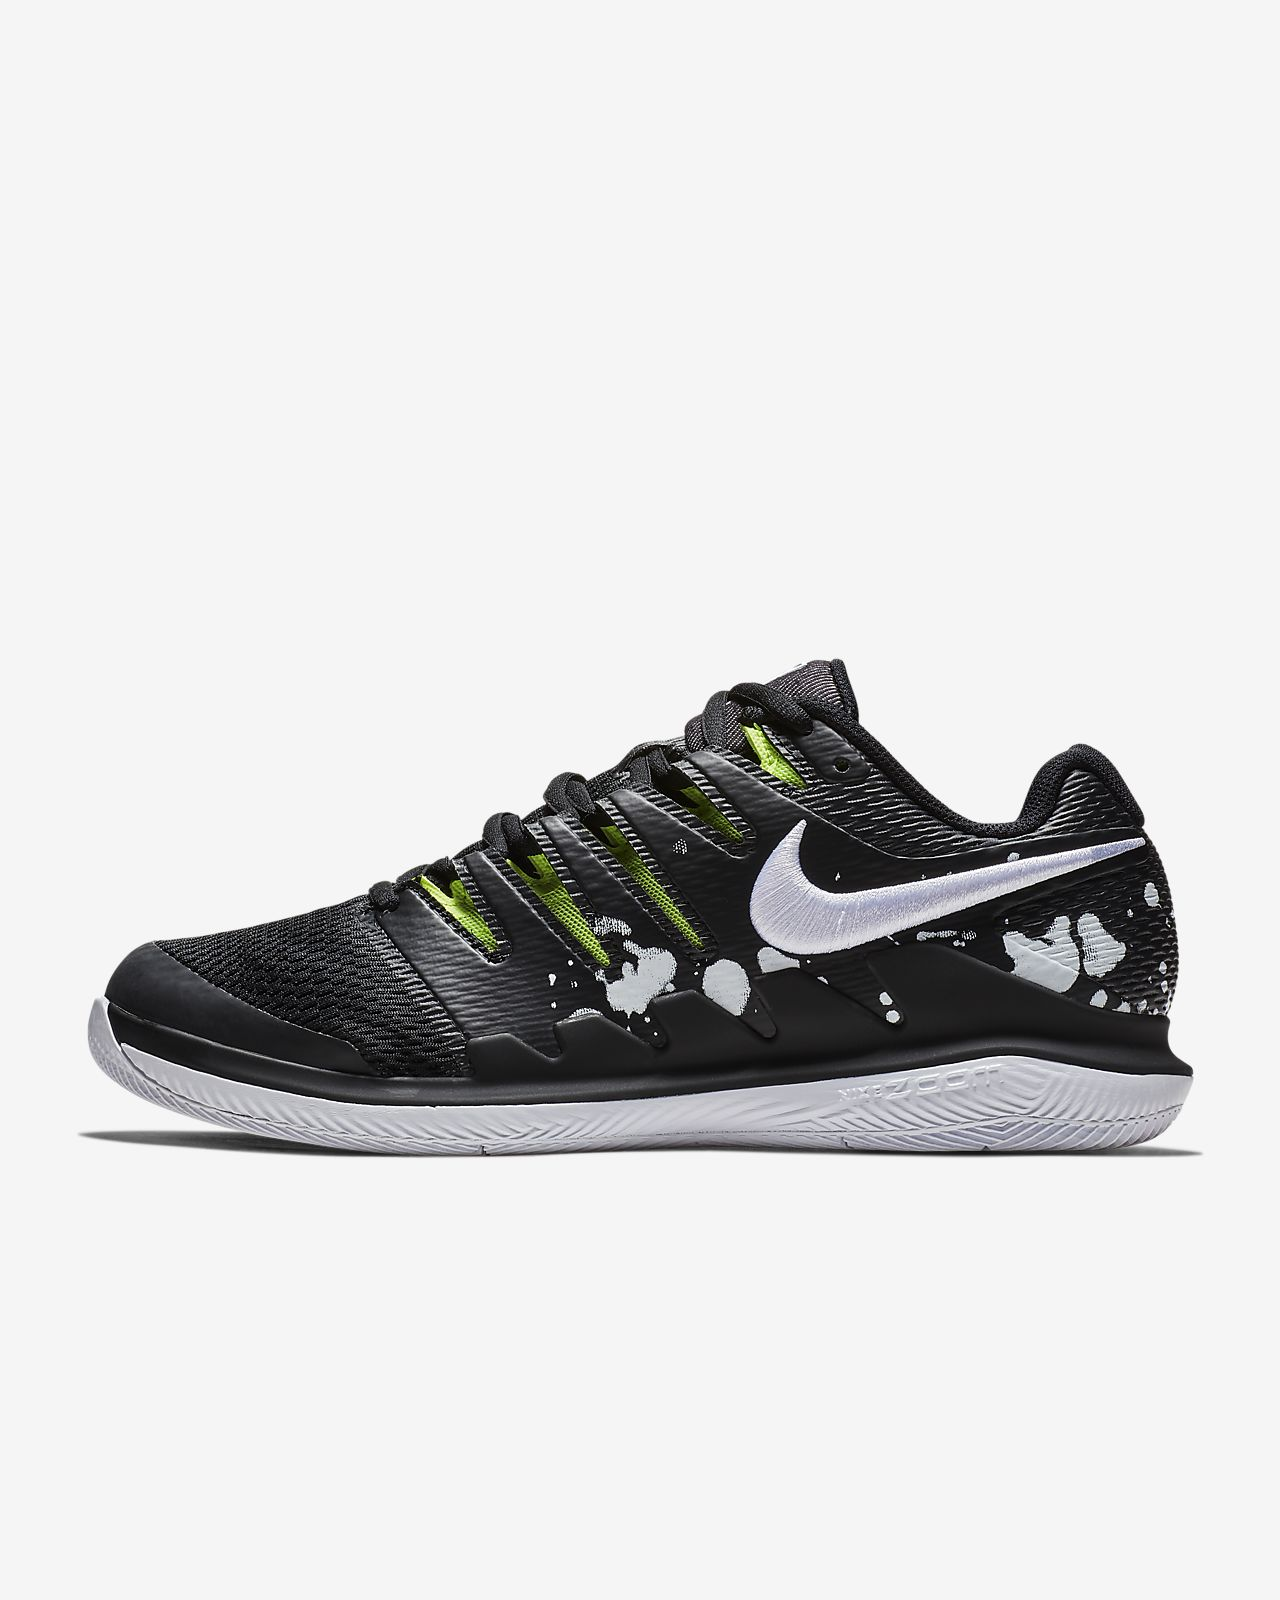 NikeCourt Air Zoom Vapor X Premium Hard Court-tennissko til mænd ... fafb9131a9